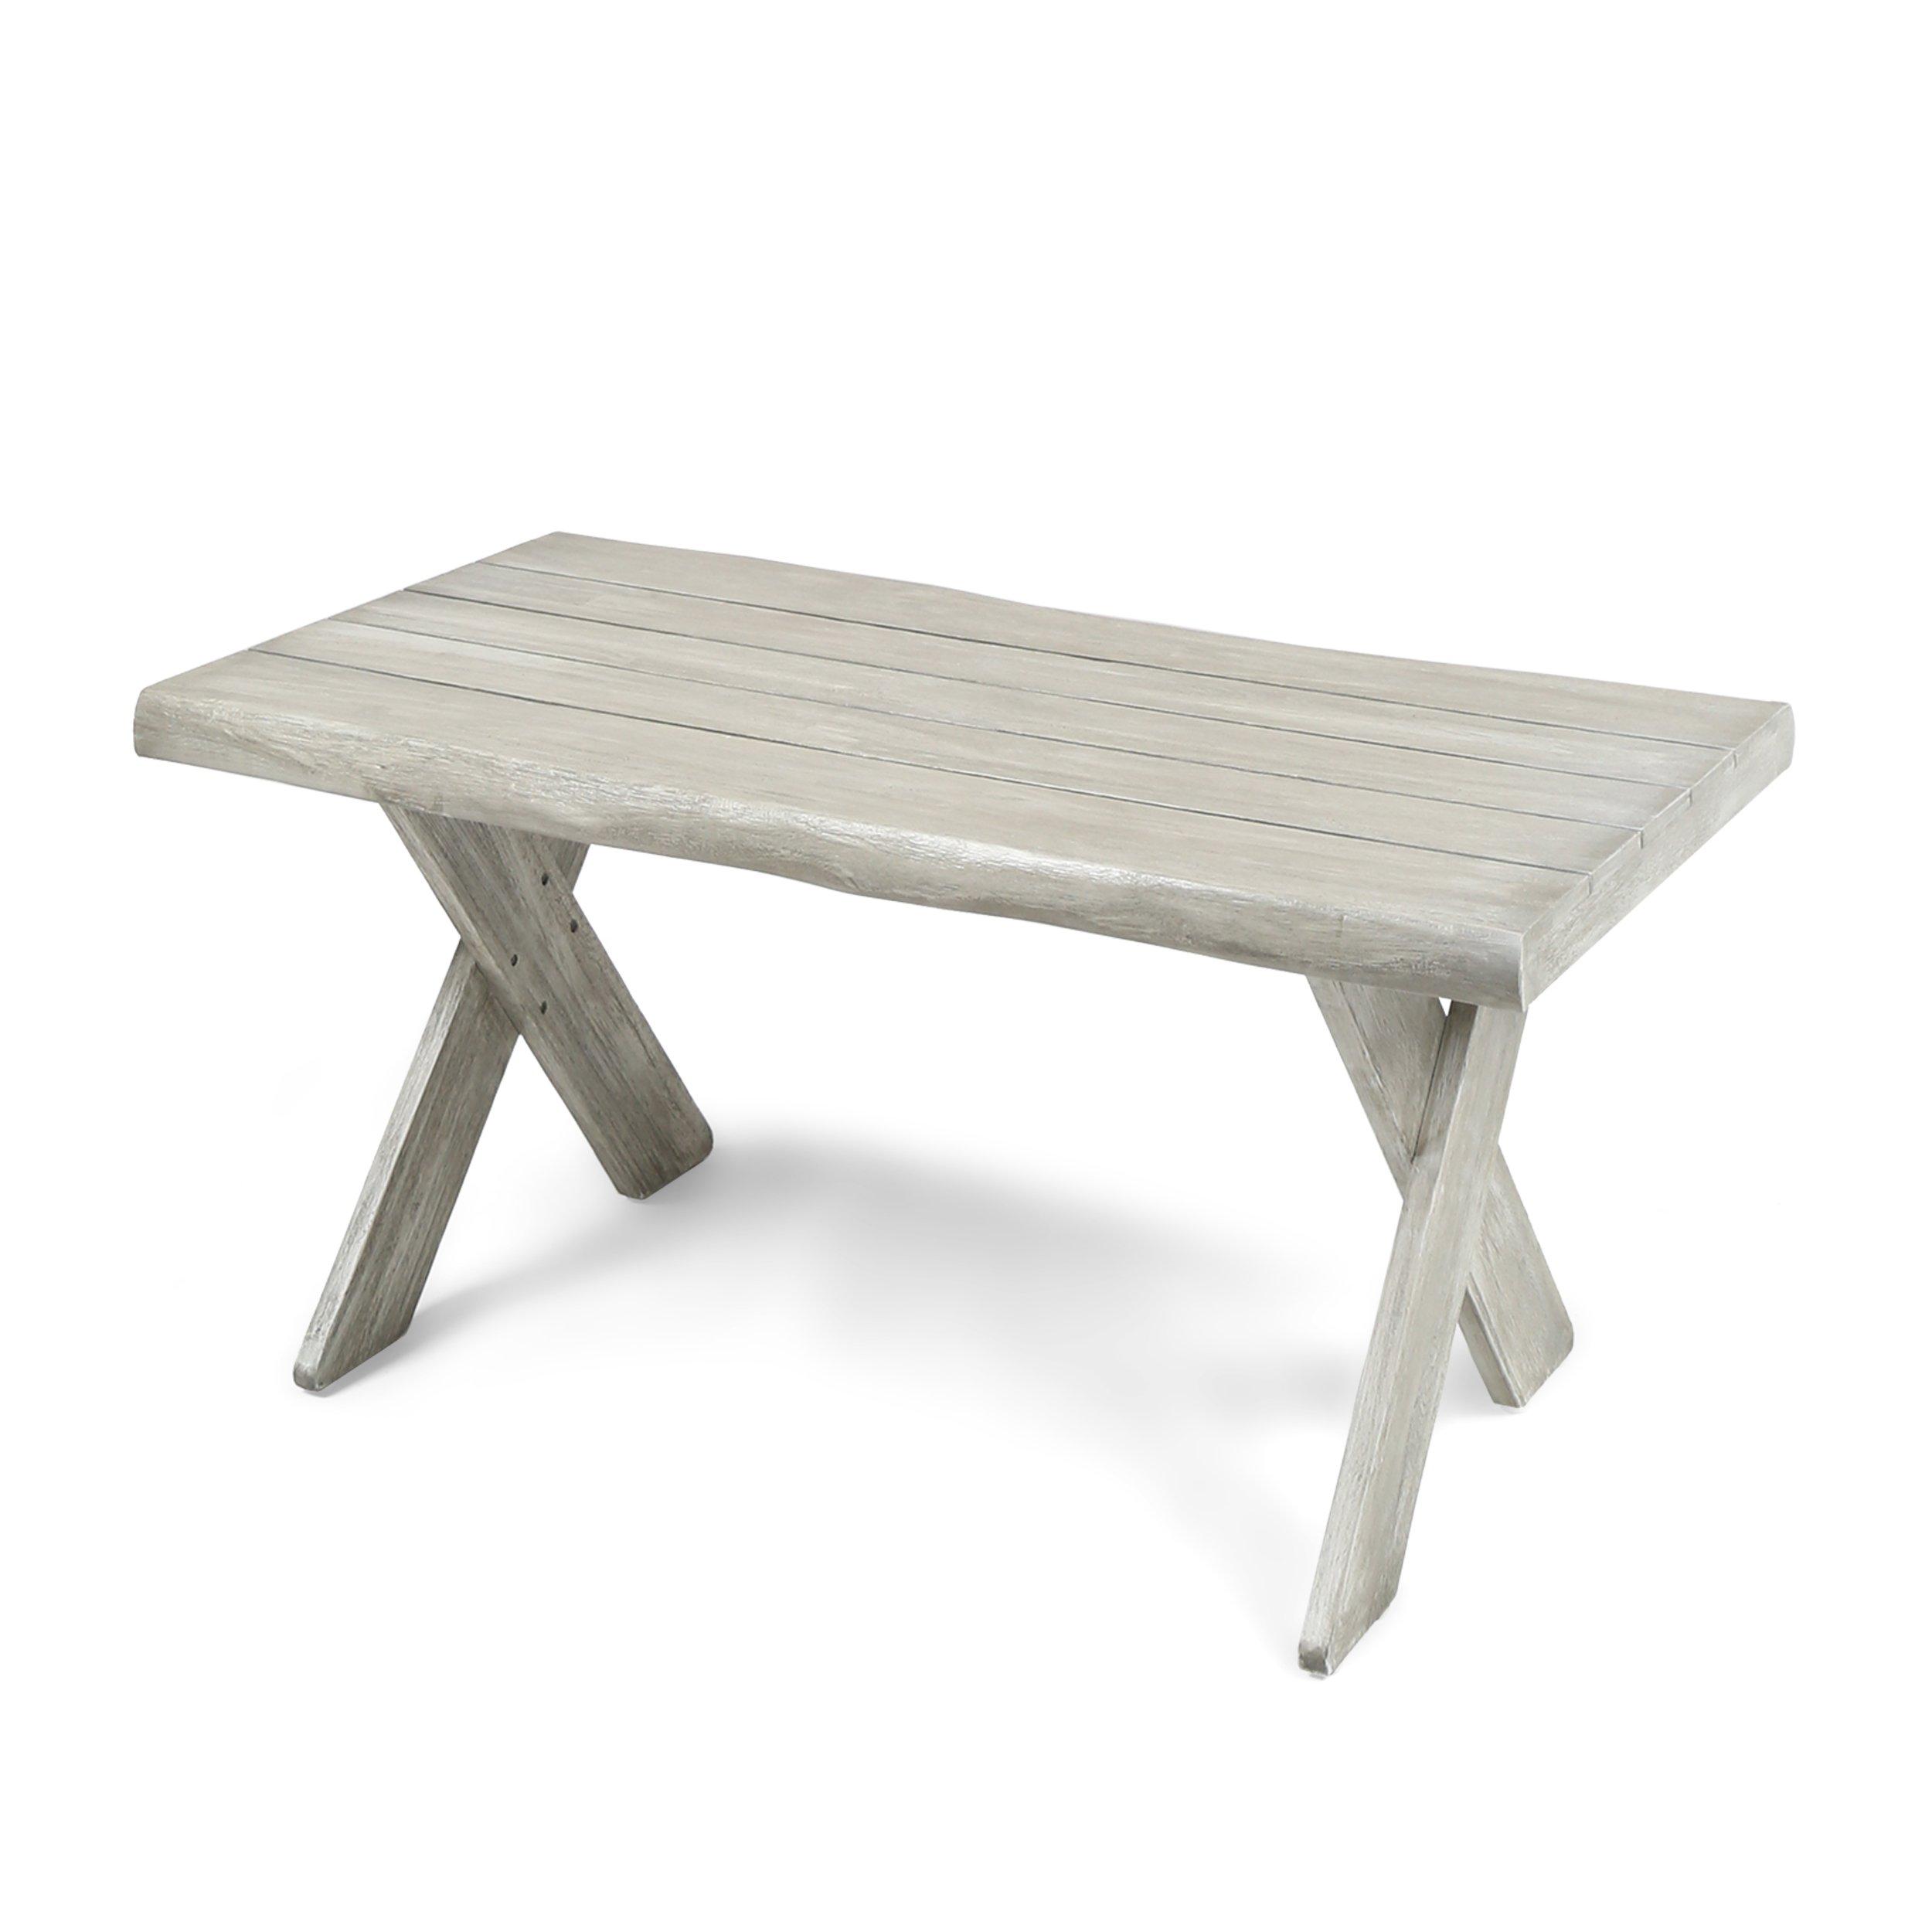 Great Deal Furniture 304413 Irene Outdoor Acacia Wood Coffee Table, Light Grey, Sandblast